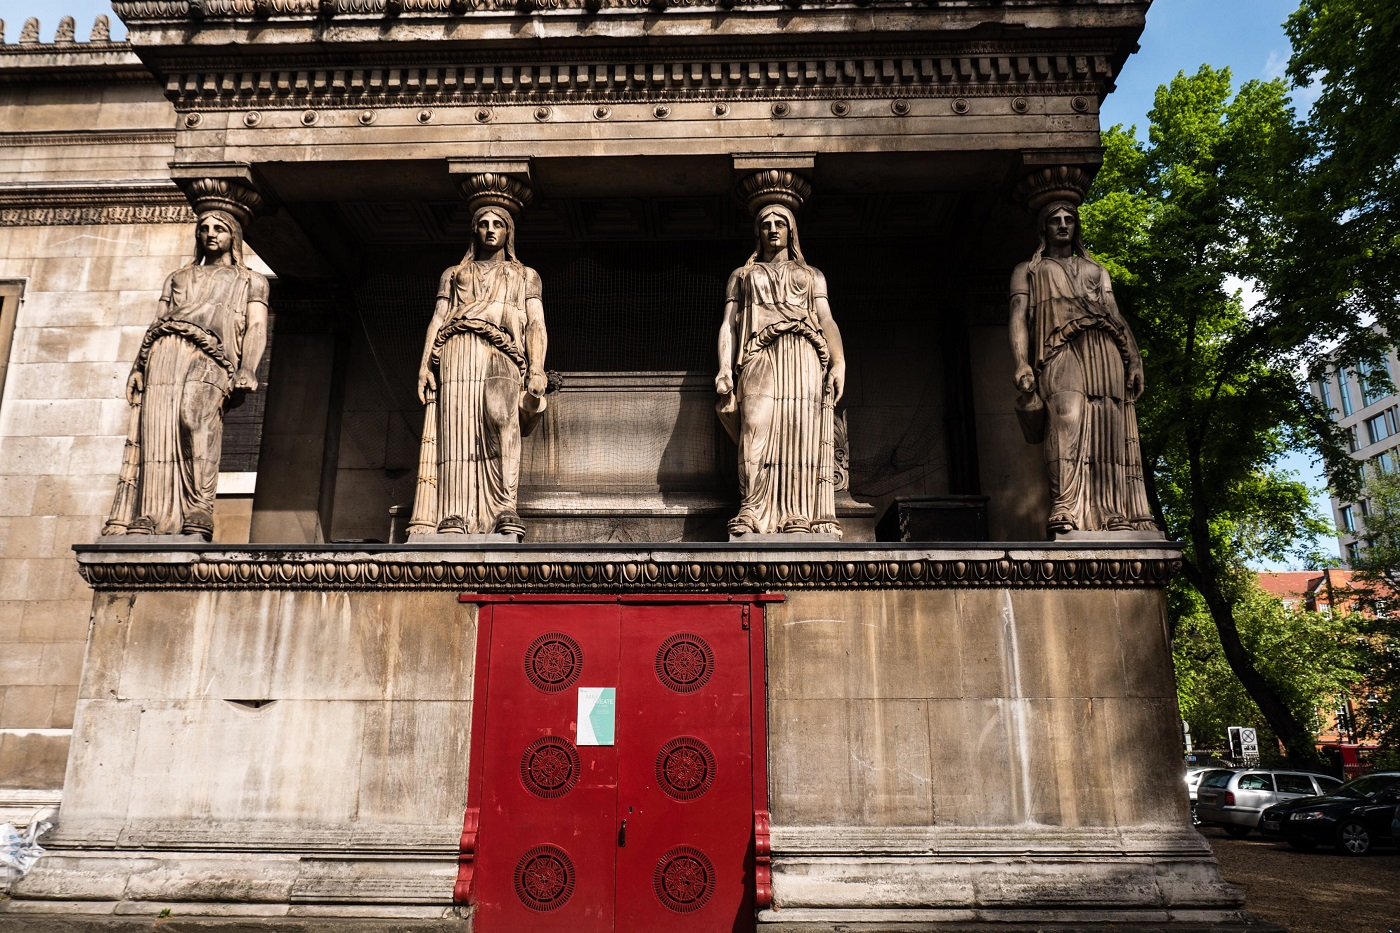 Le Migliori Gallerie d'Arte Di Londra